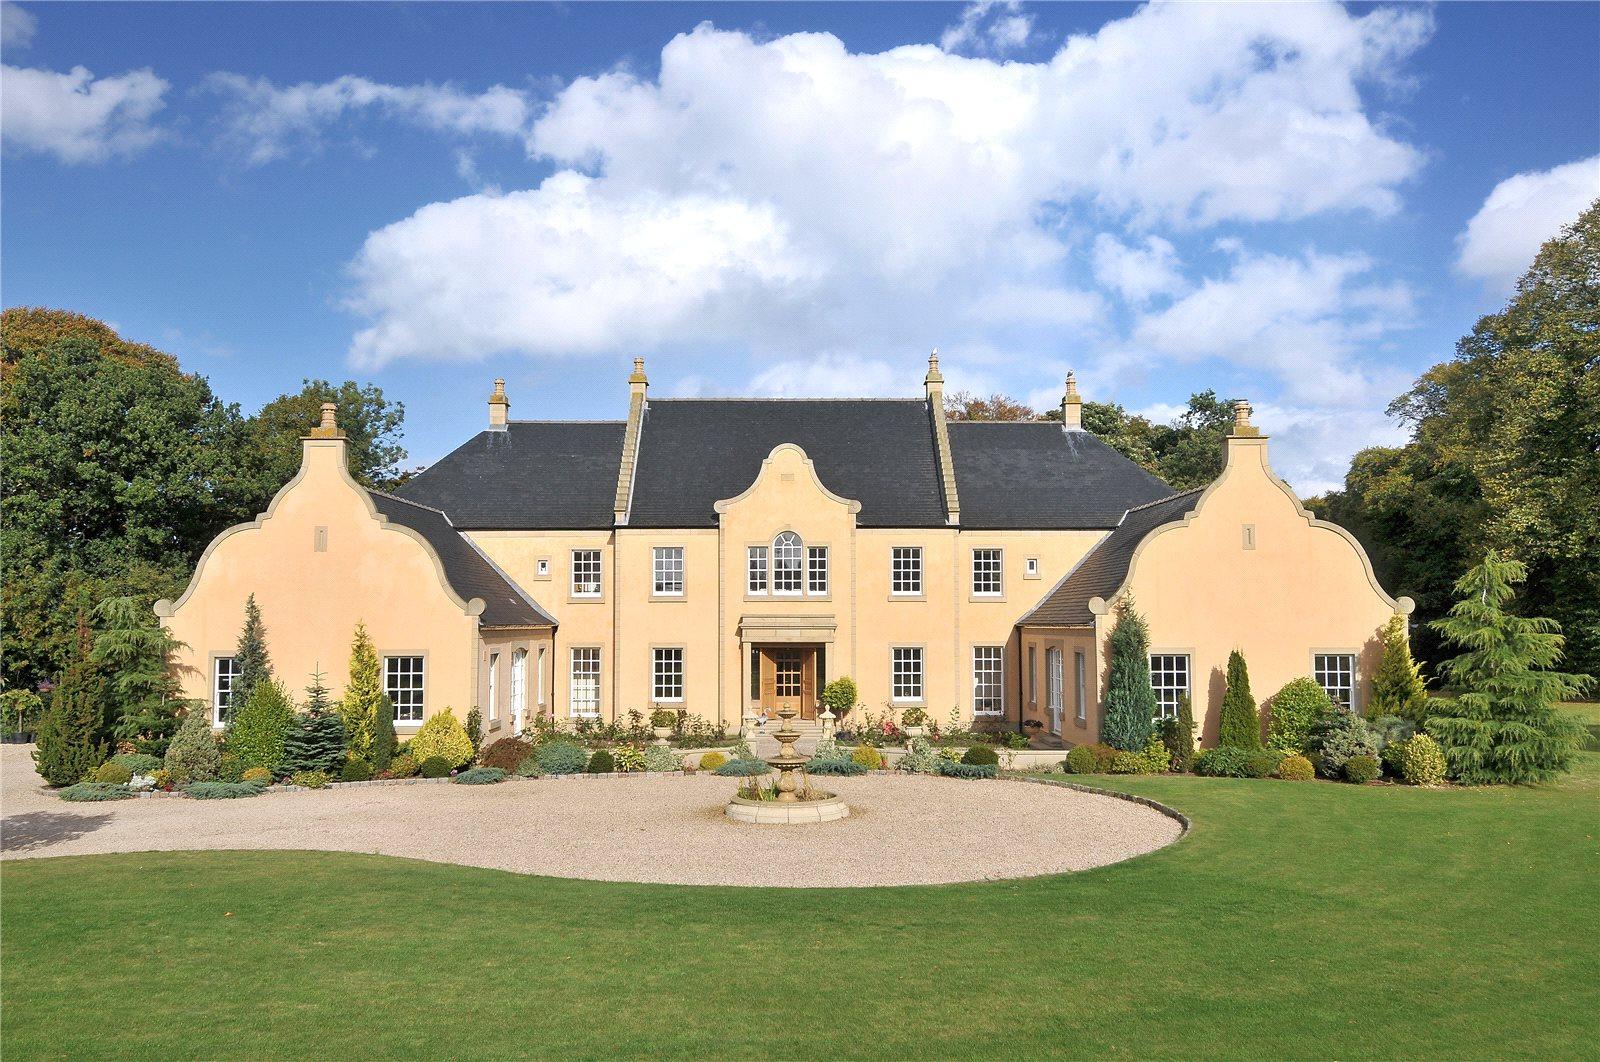 Villa per Vendita alle ore Inveresk Village, Musselburgh, Midlothian, EH21 Midlothian, Scozia